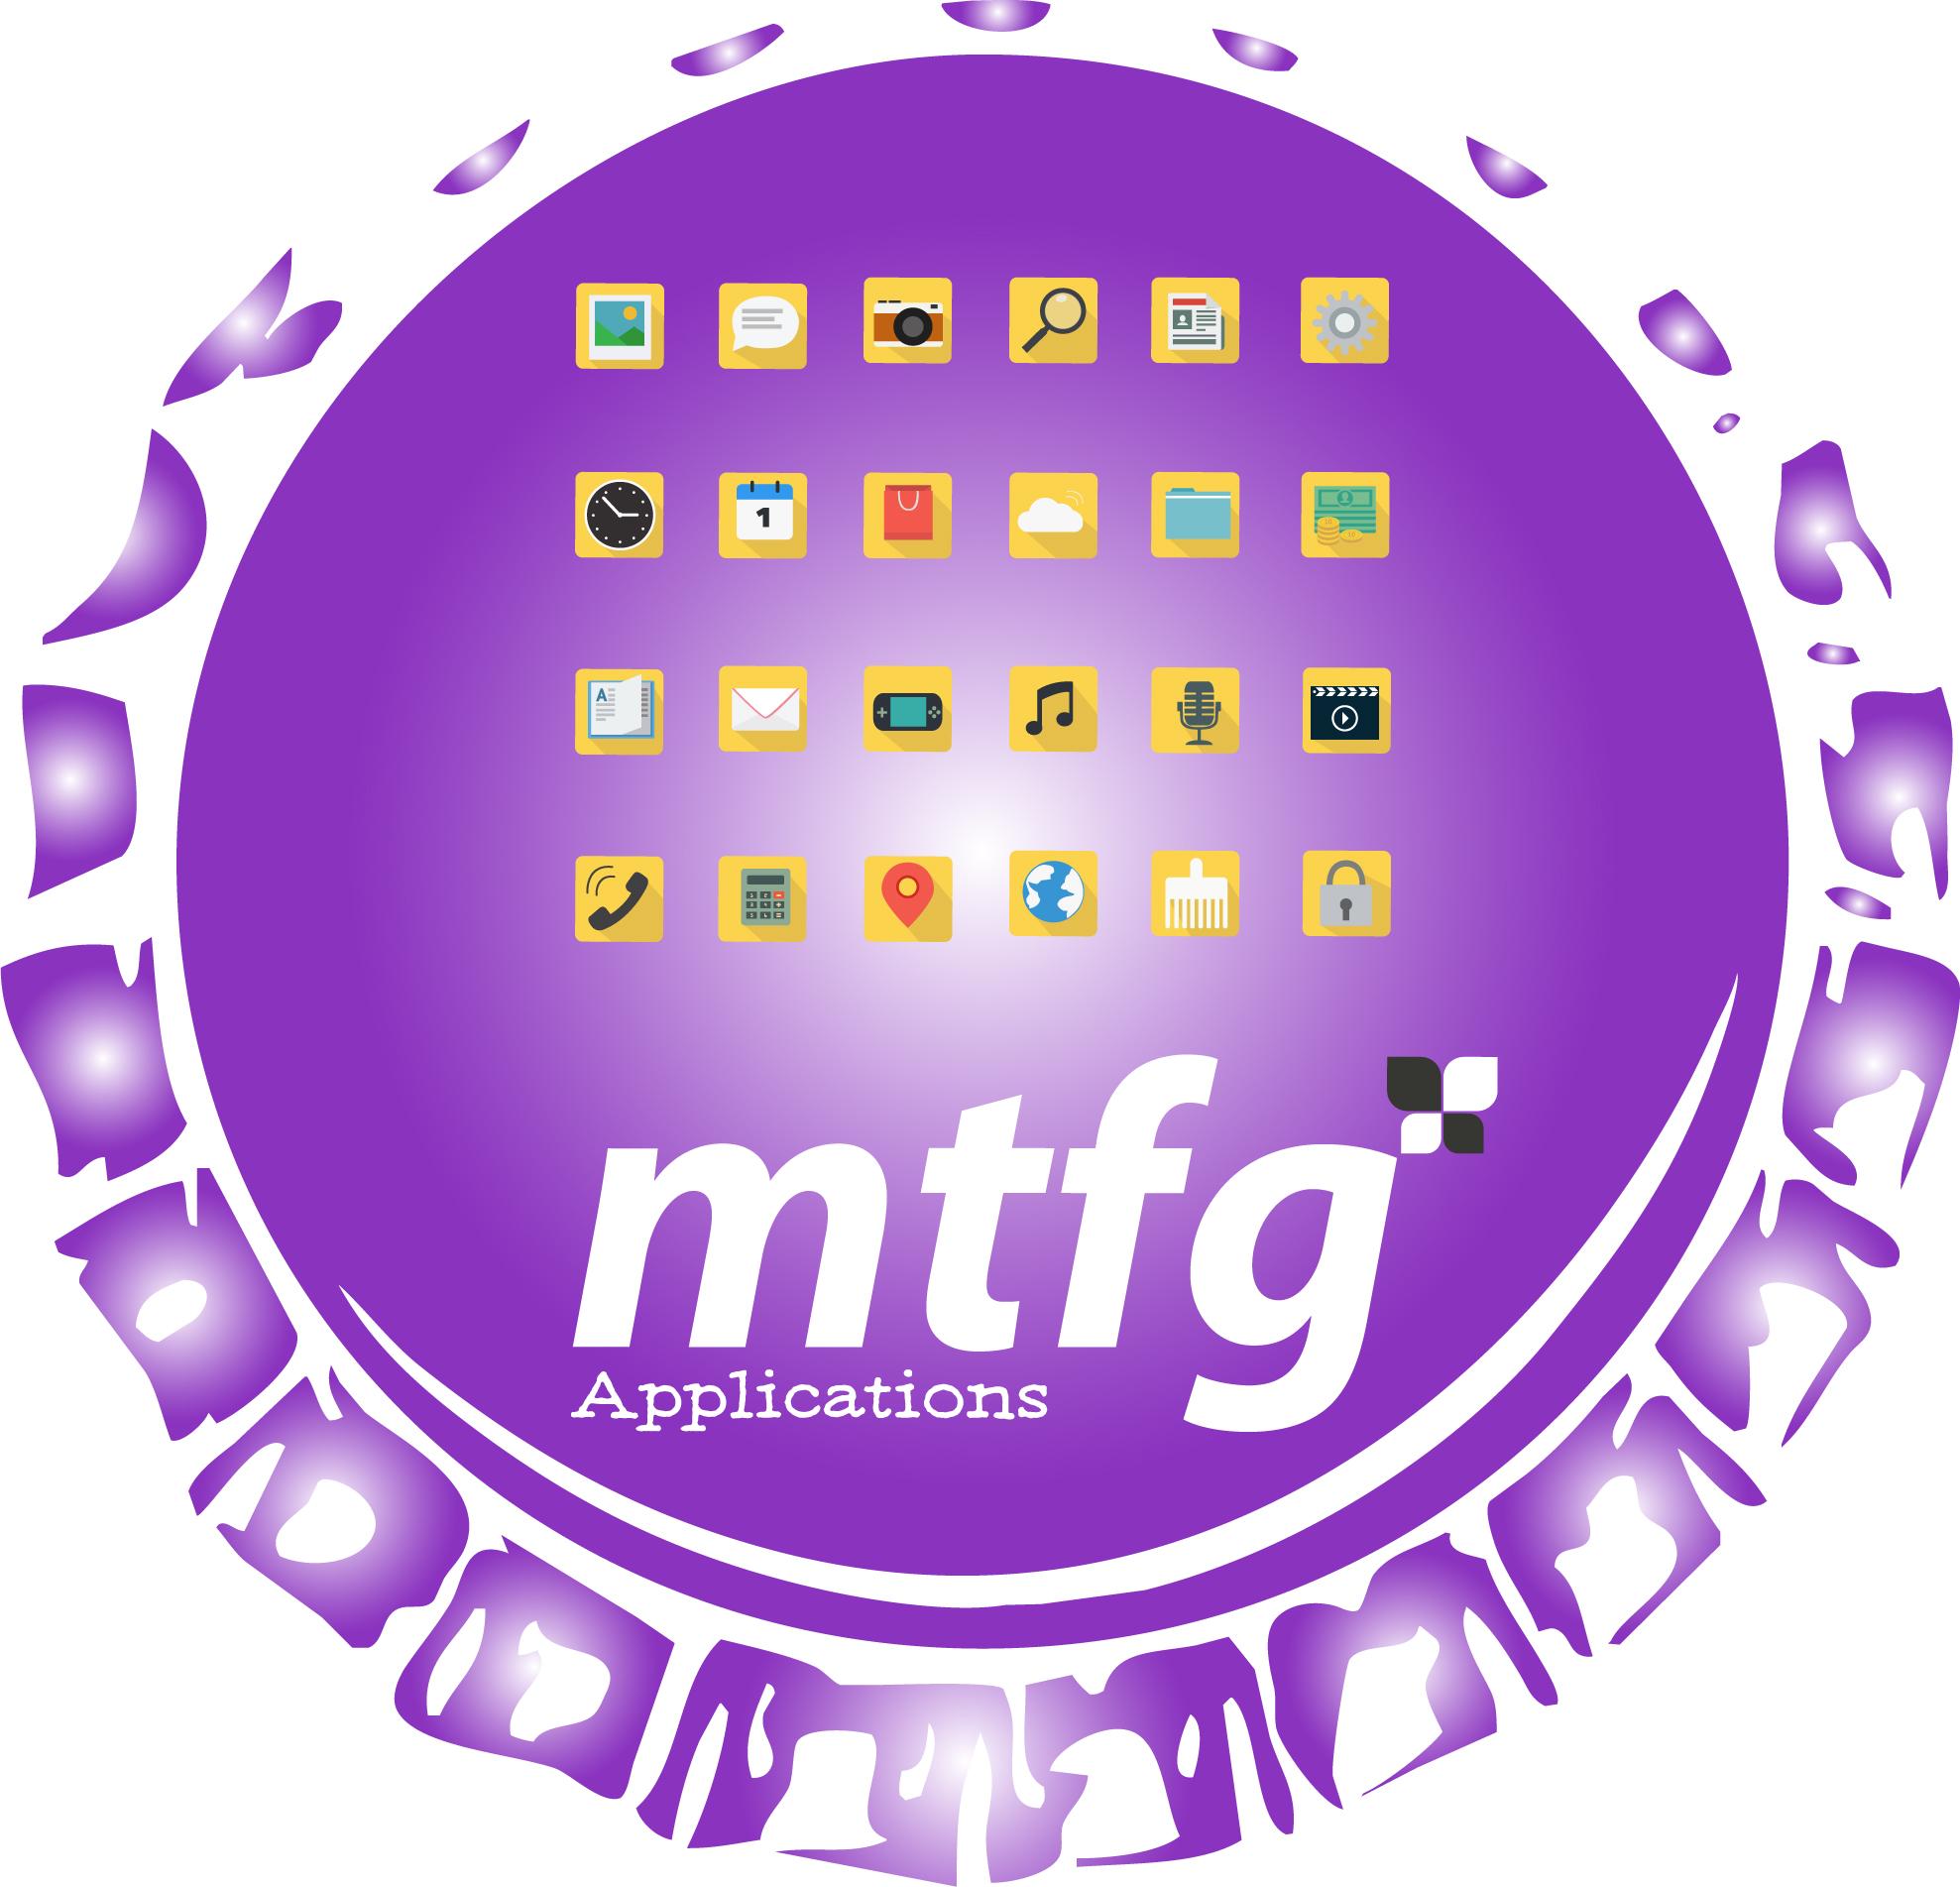 MTFG Applications